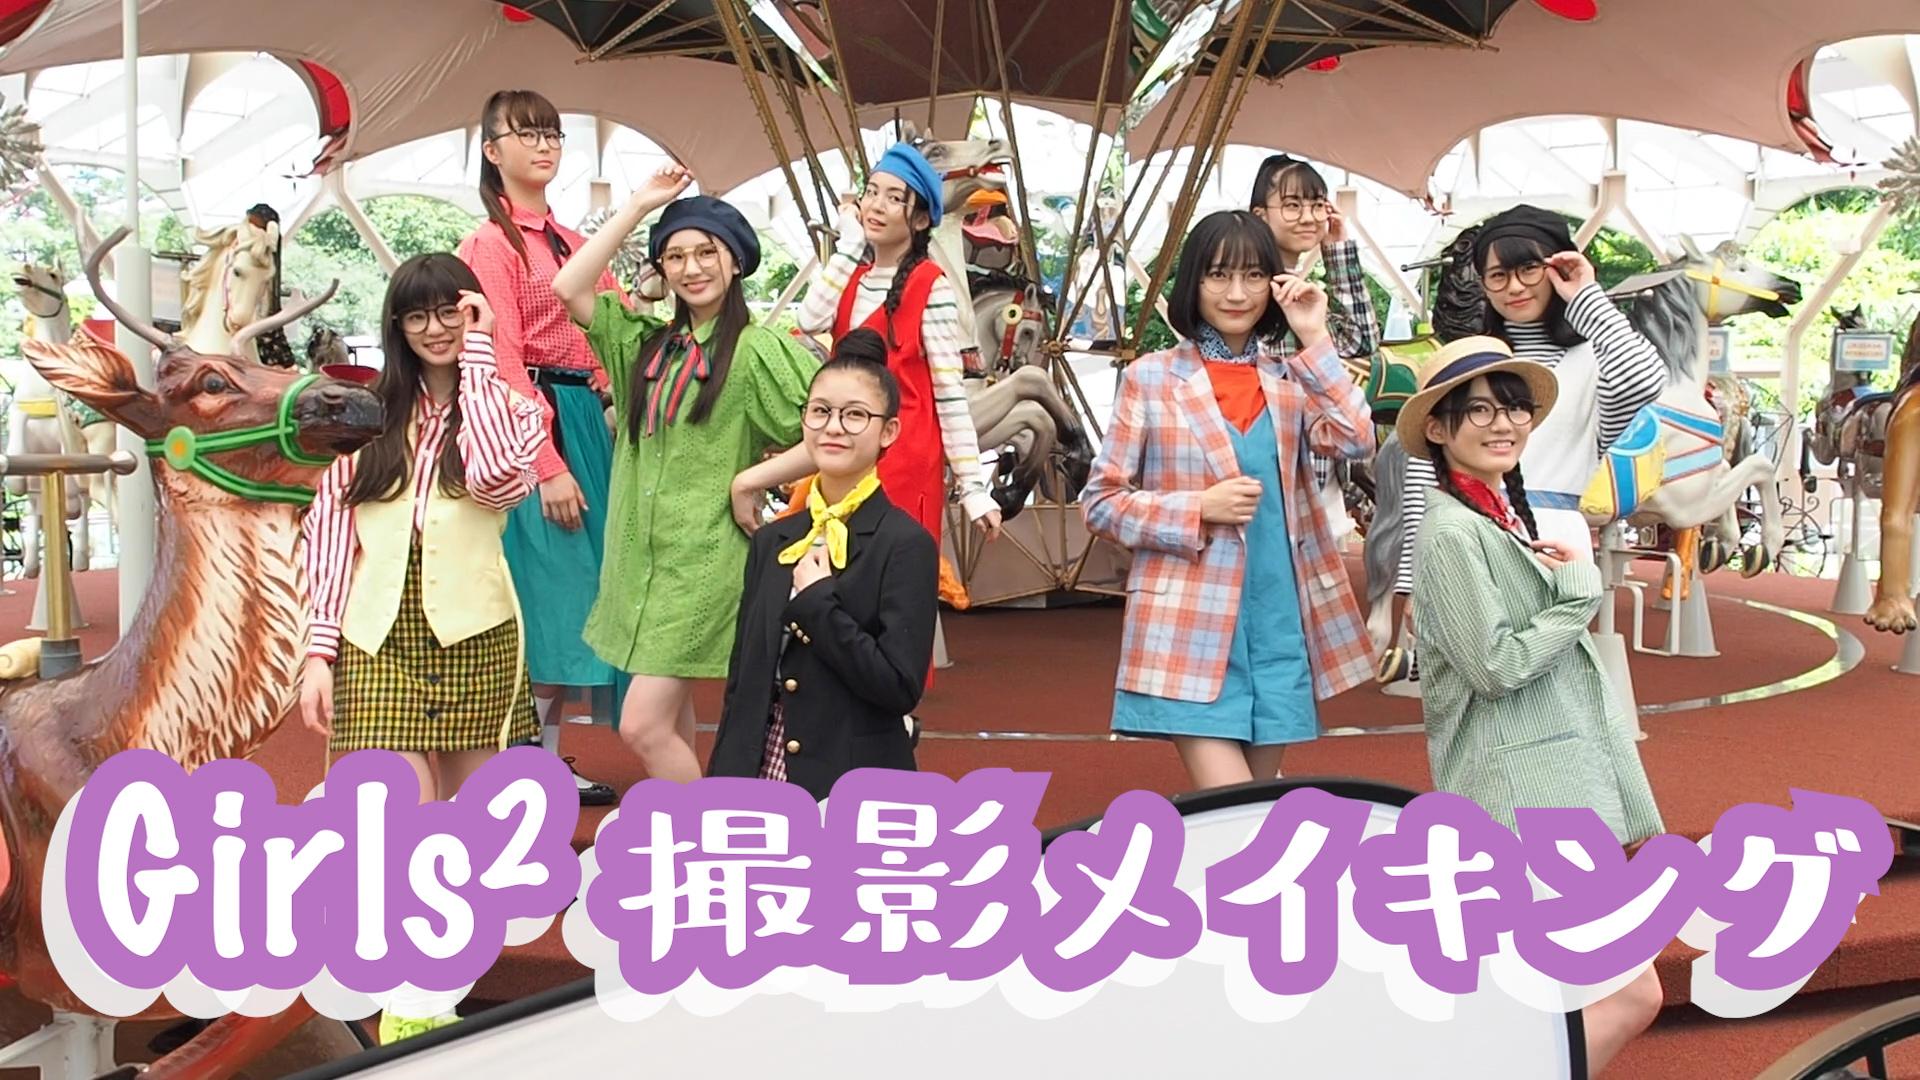 Girls2、CMNOW撮影メイキング  遊園地でキュートに撮影!